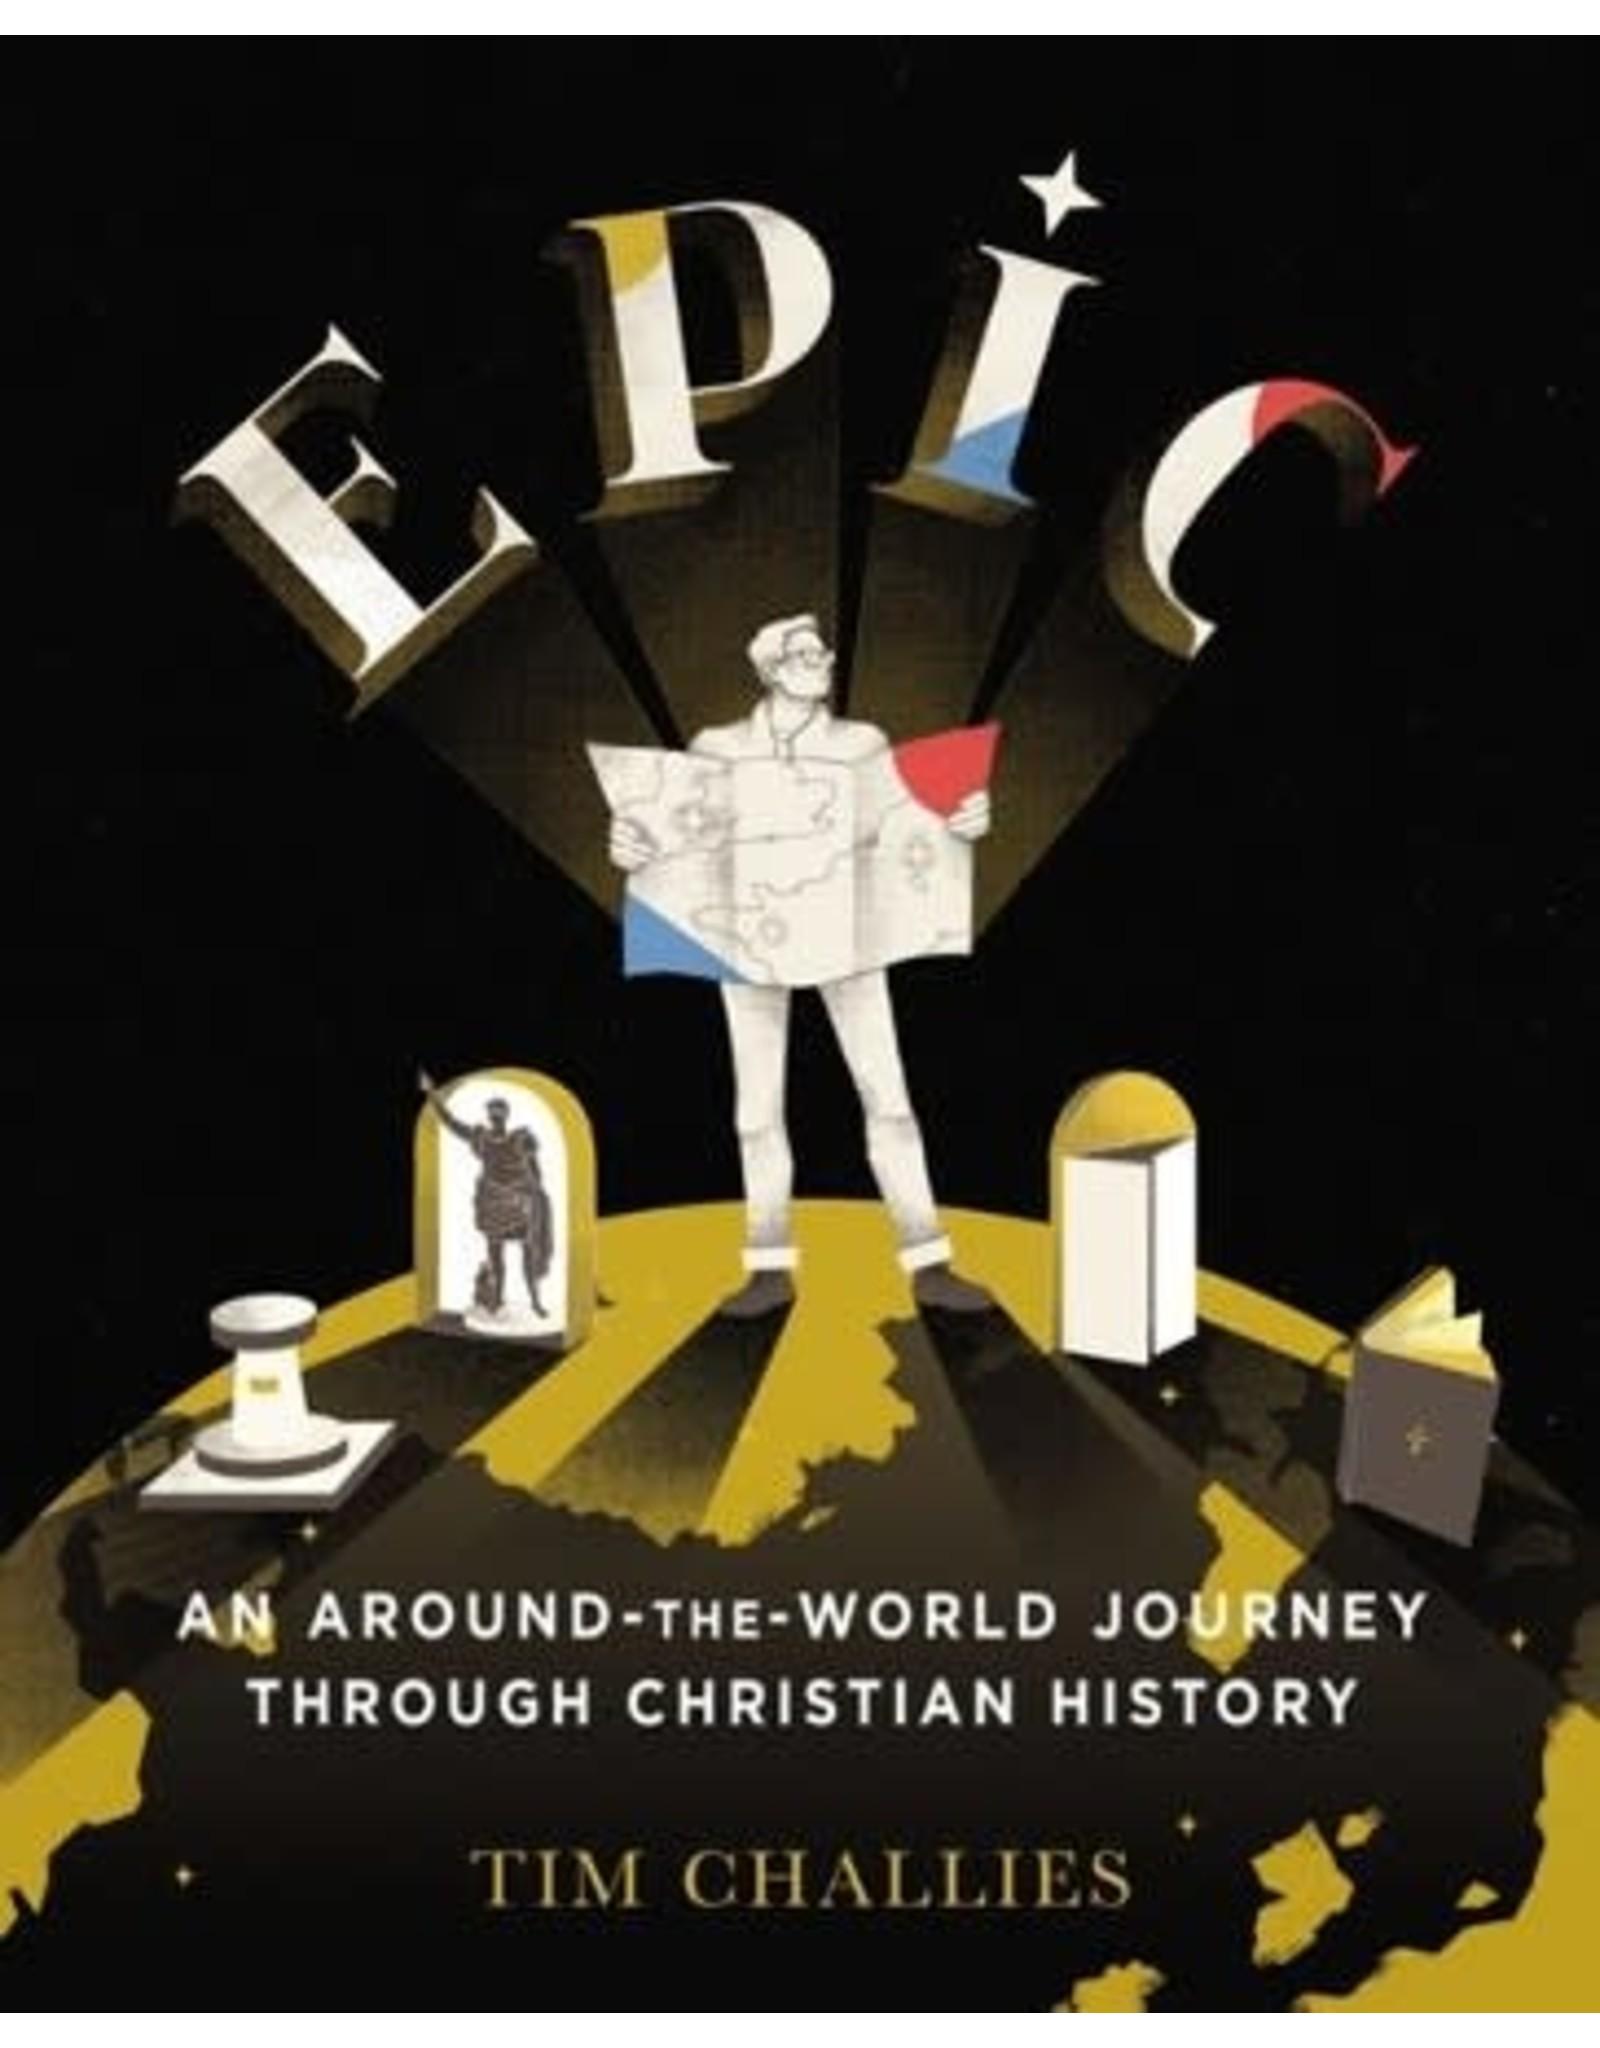 Harper Collins / Thomas Nelson / Zondervan Epic: An Around-the-World Journey through Christian History